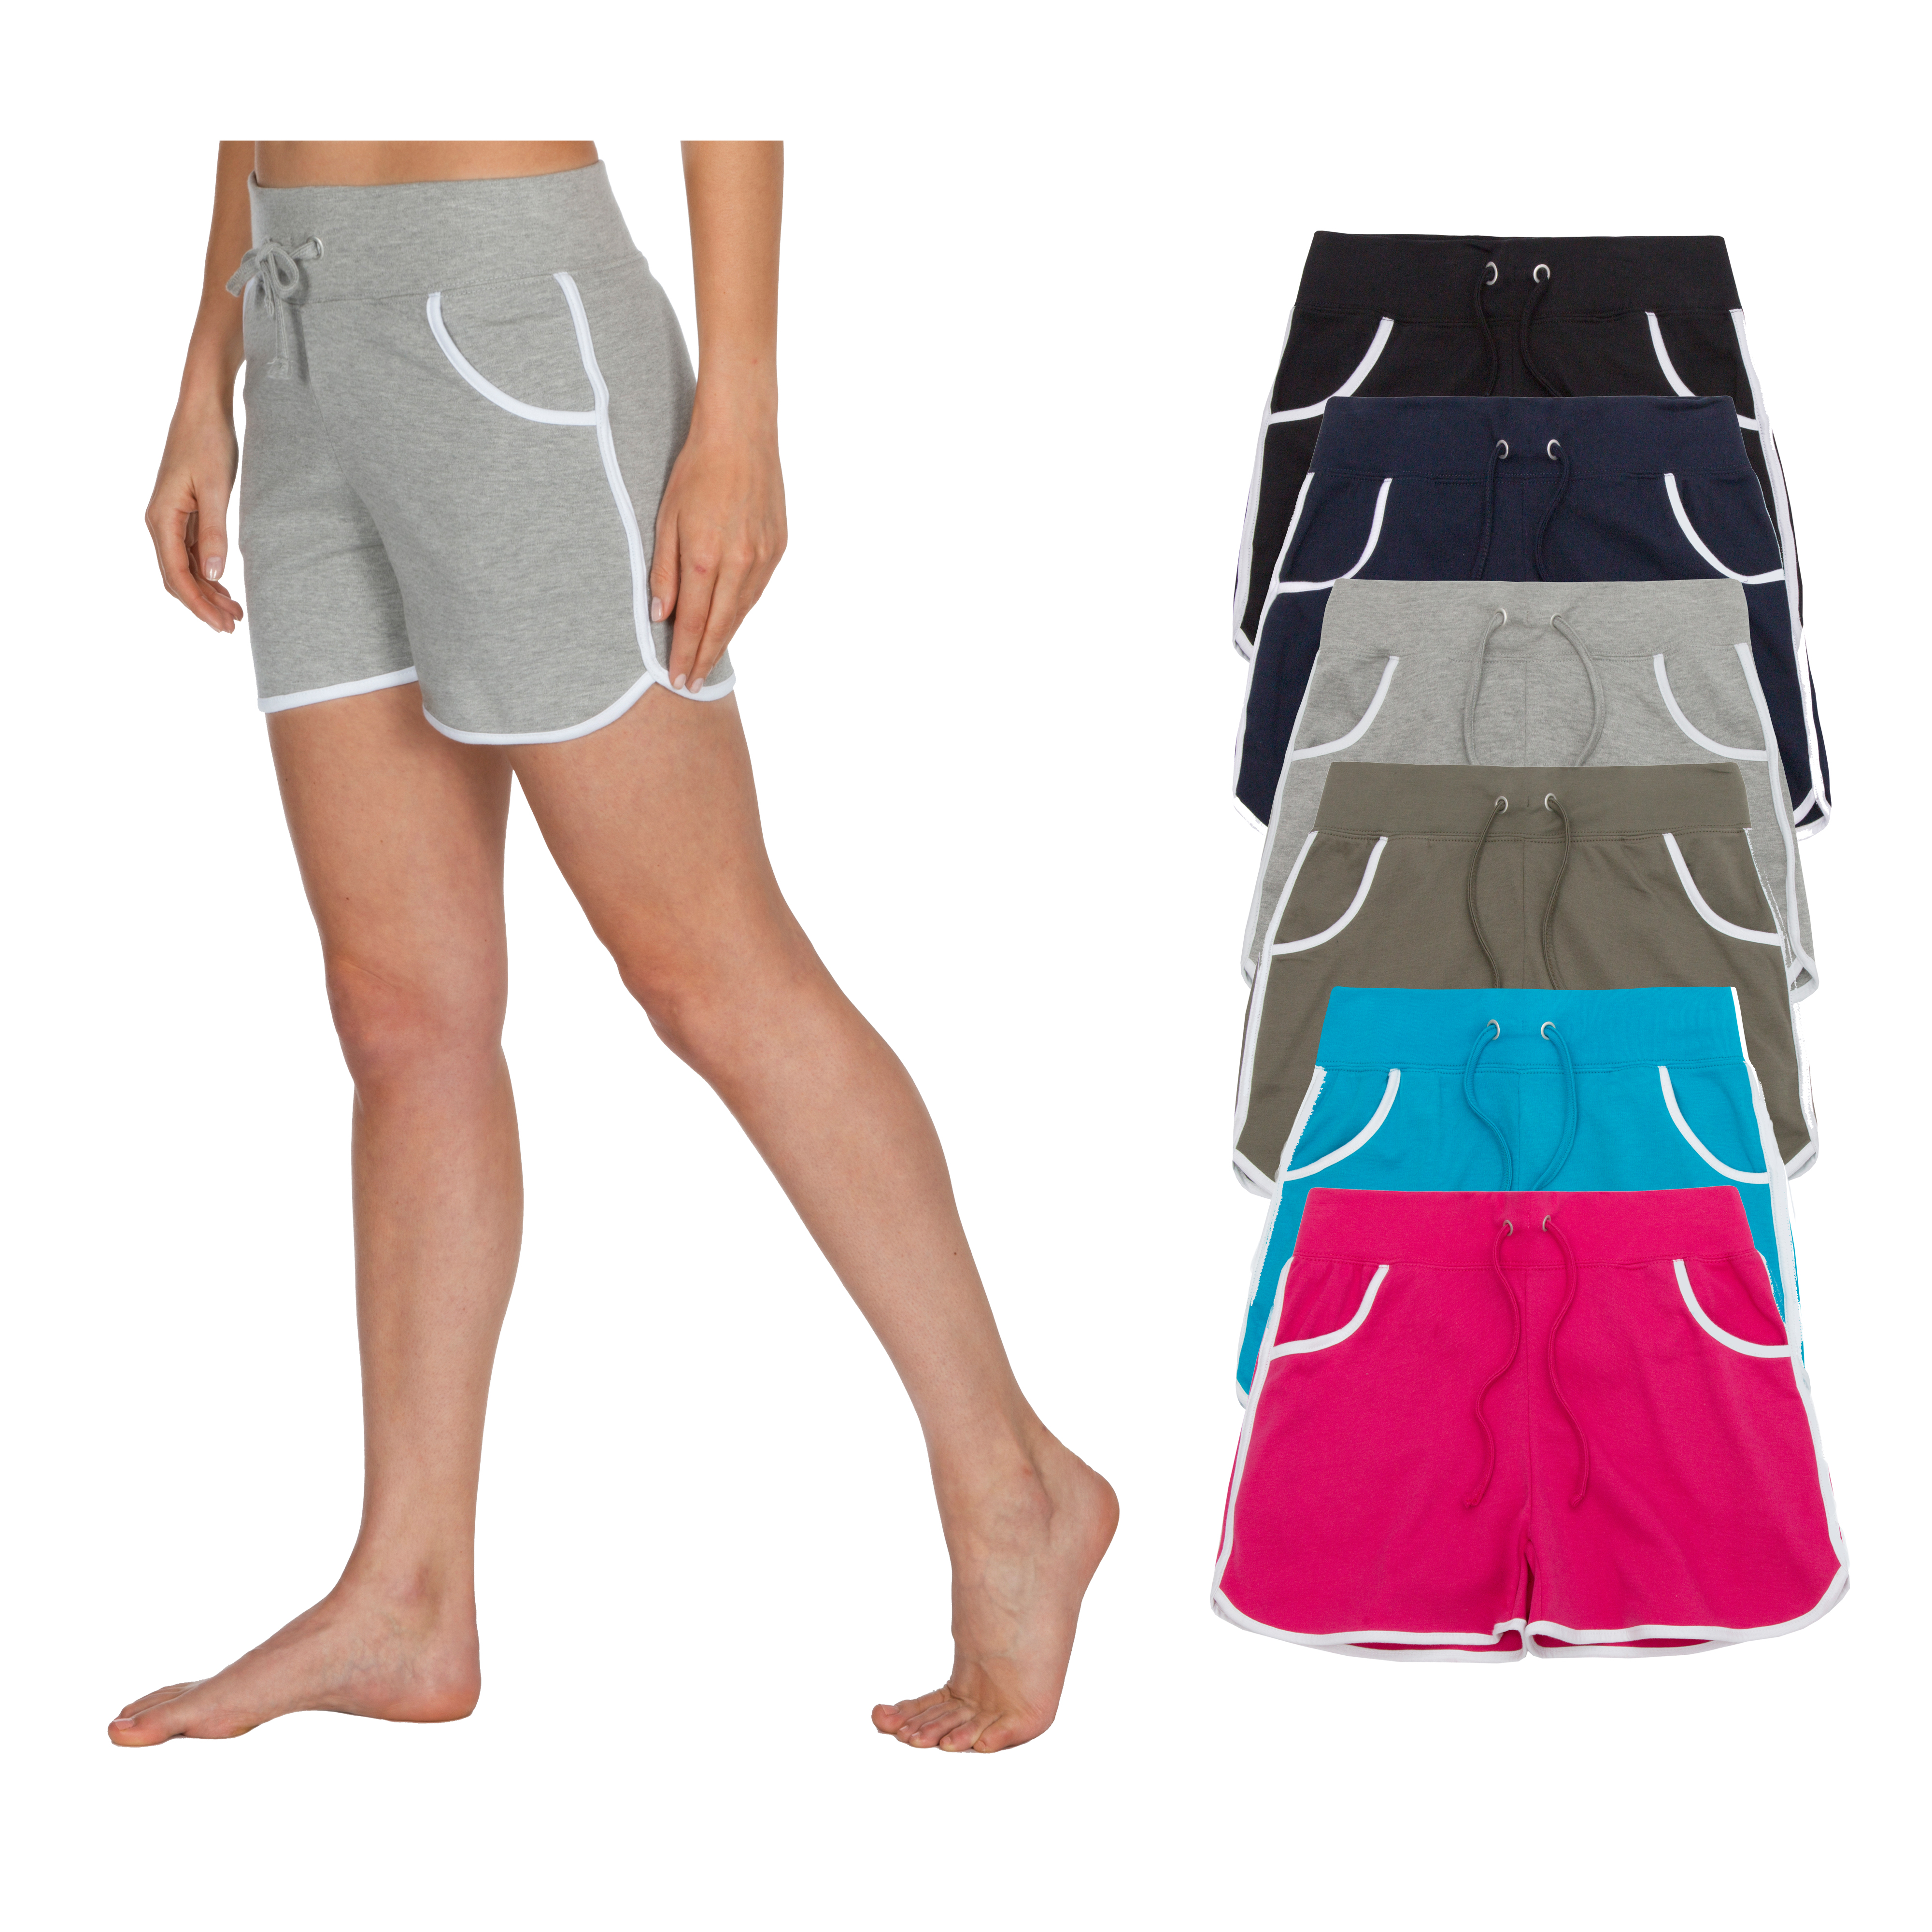 Womens Ladies Shorts SUMMER COTTON JOG STYLE RETRO 2 STRIPE BEACH GYM HOLIDAY  x